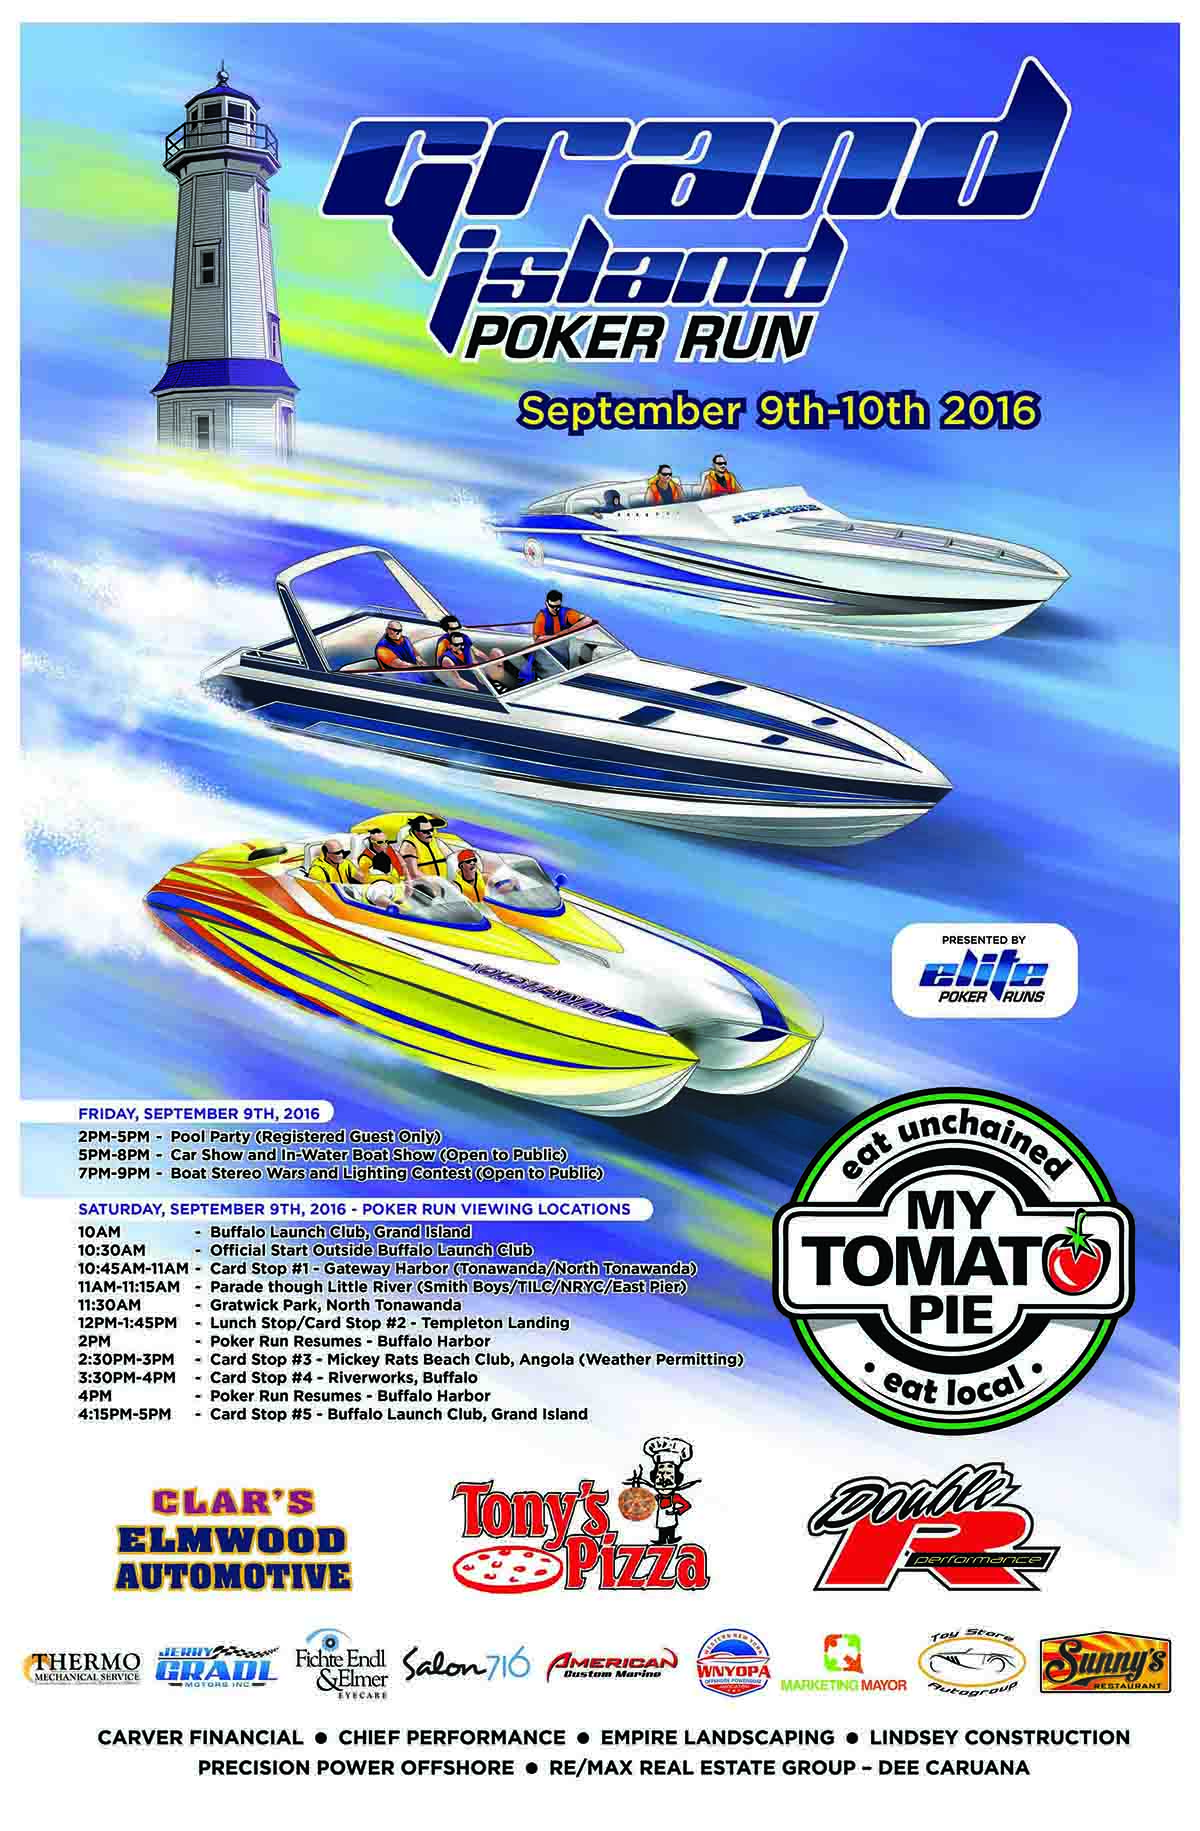 Grand Island Poker Run - POSTER